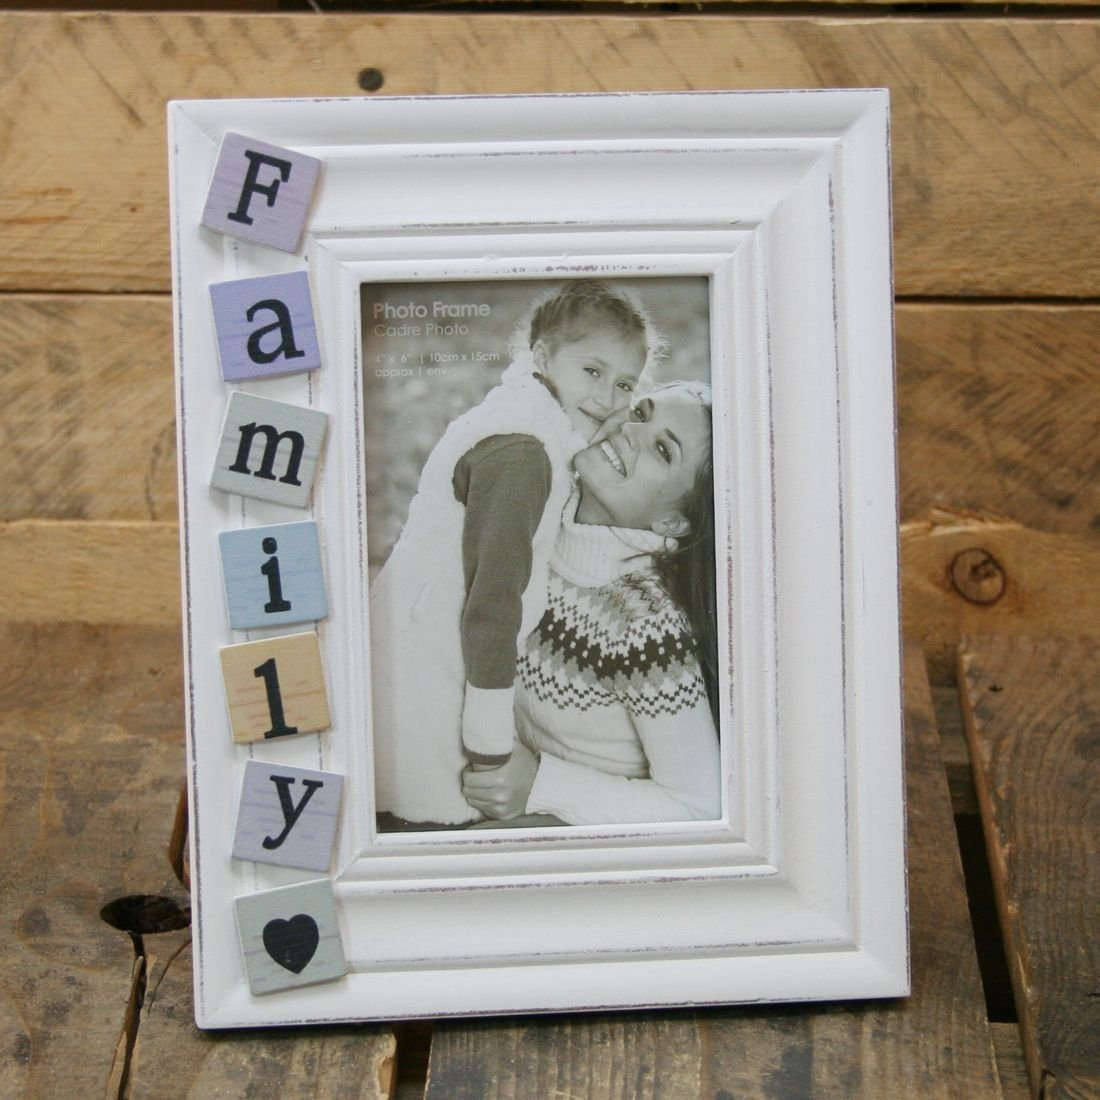 Amazon.de: 4 X 6, Shabby Chic, White Washed Fliesen Family ...